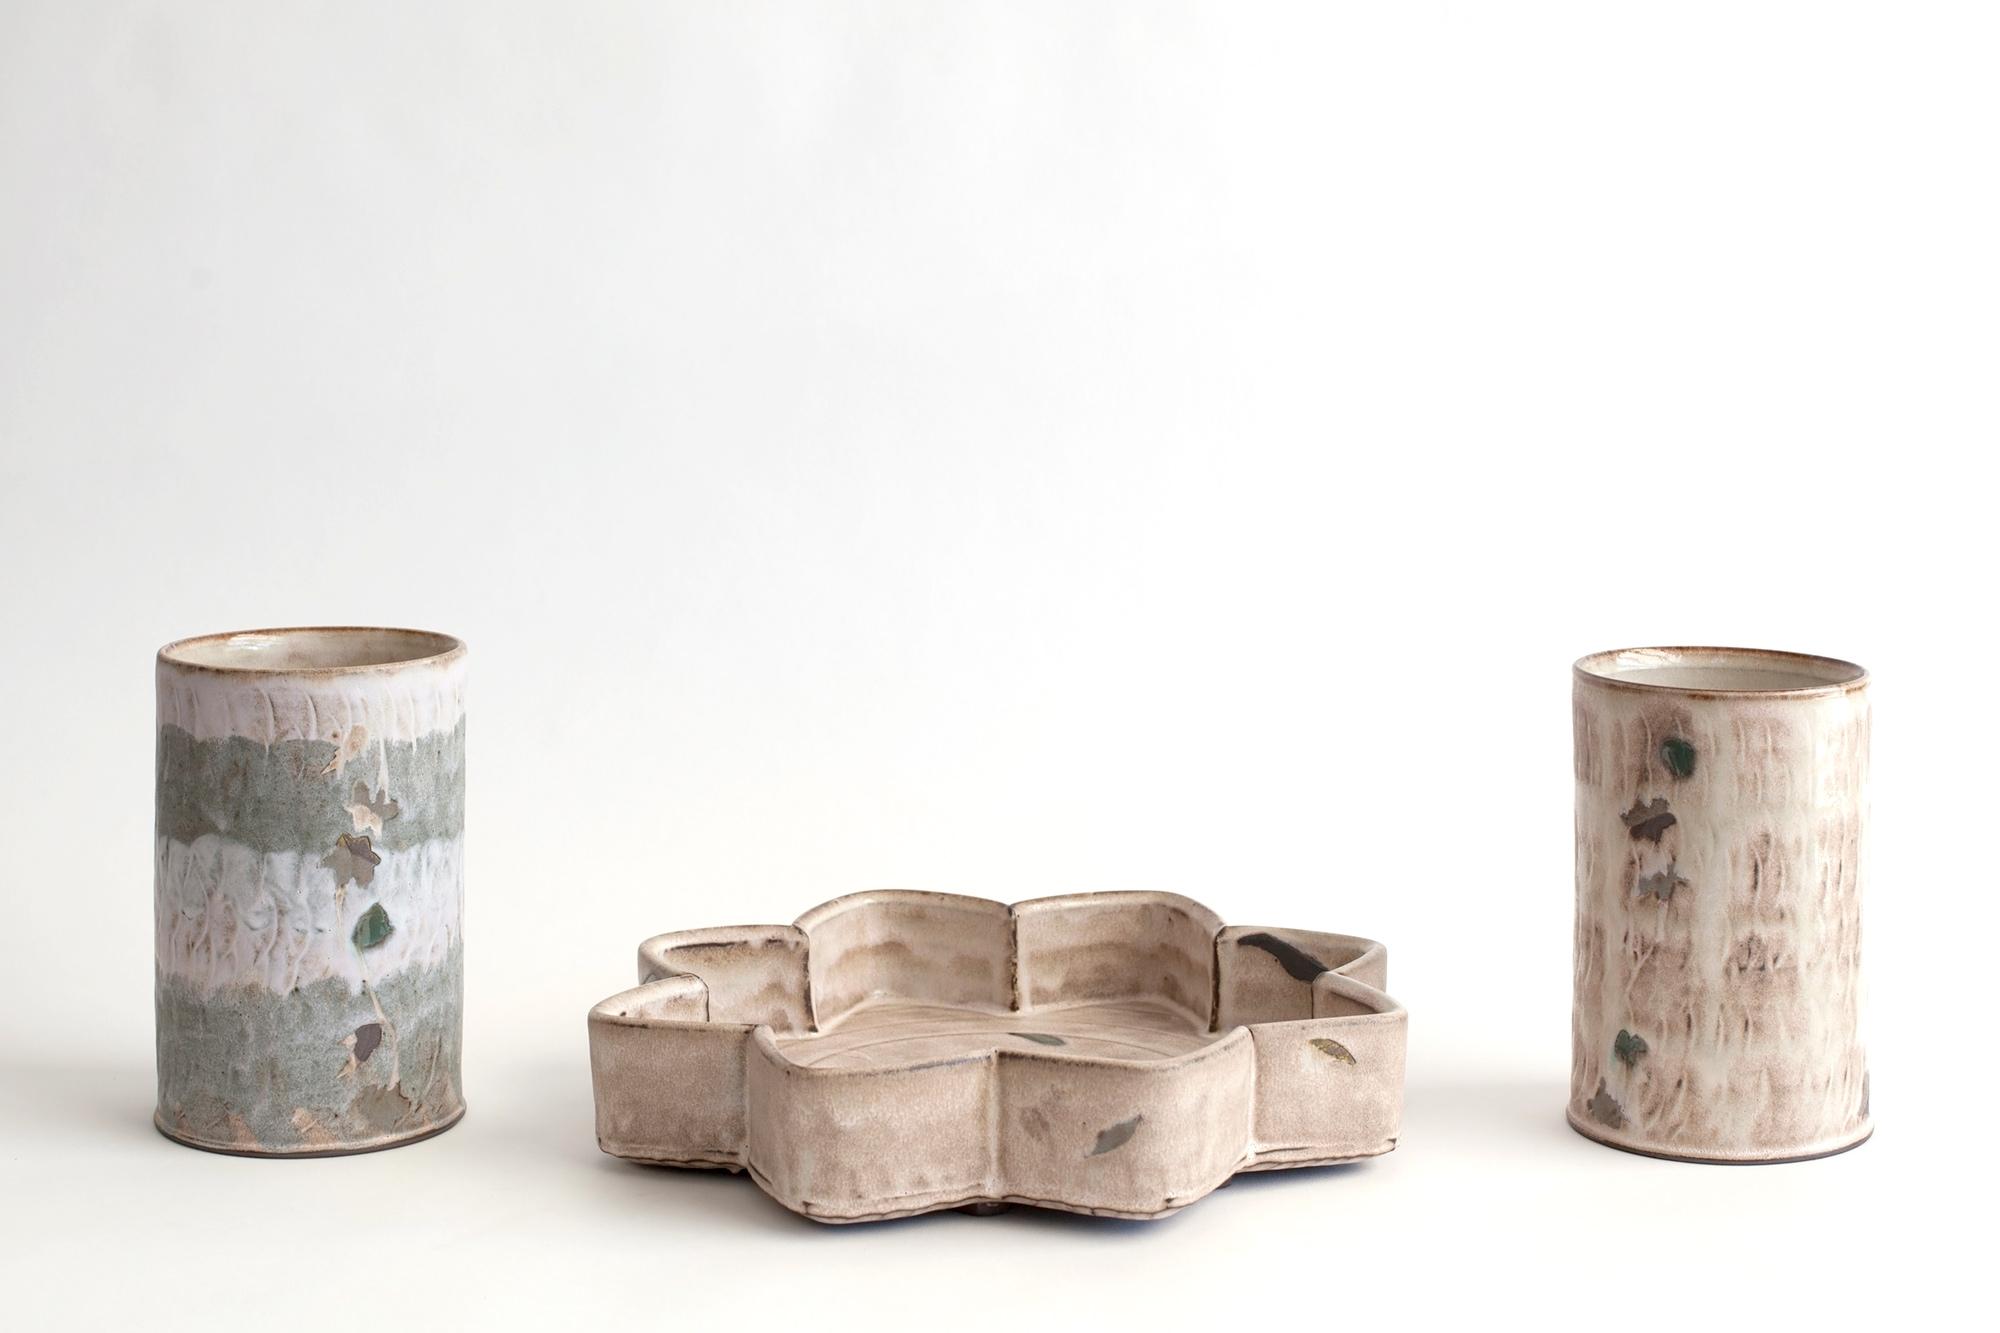 Sanam Emami, Centerpiece with Two Vases, 2021, 2021